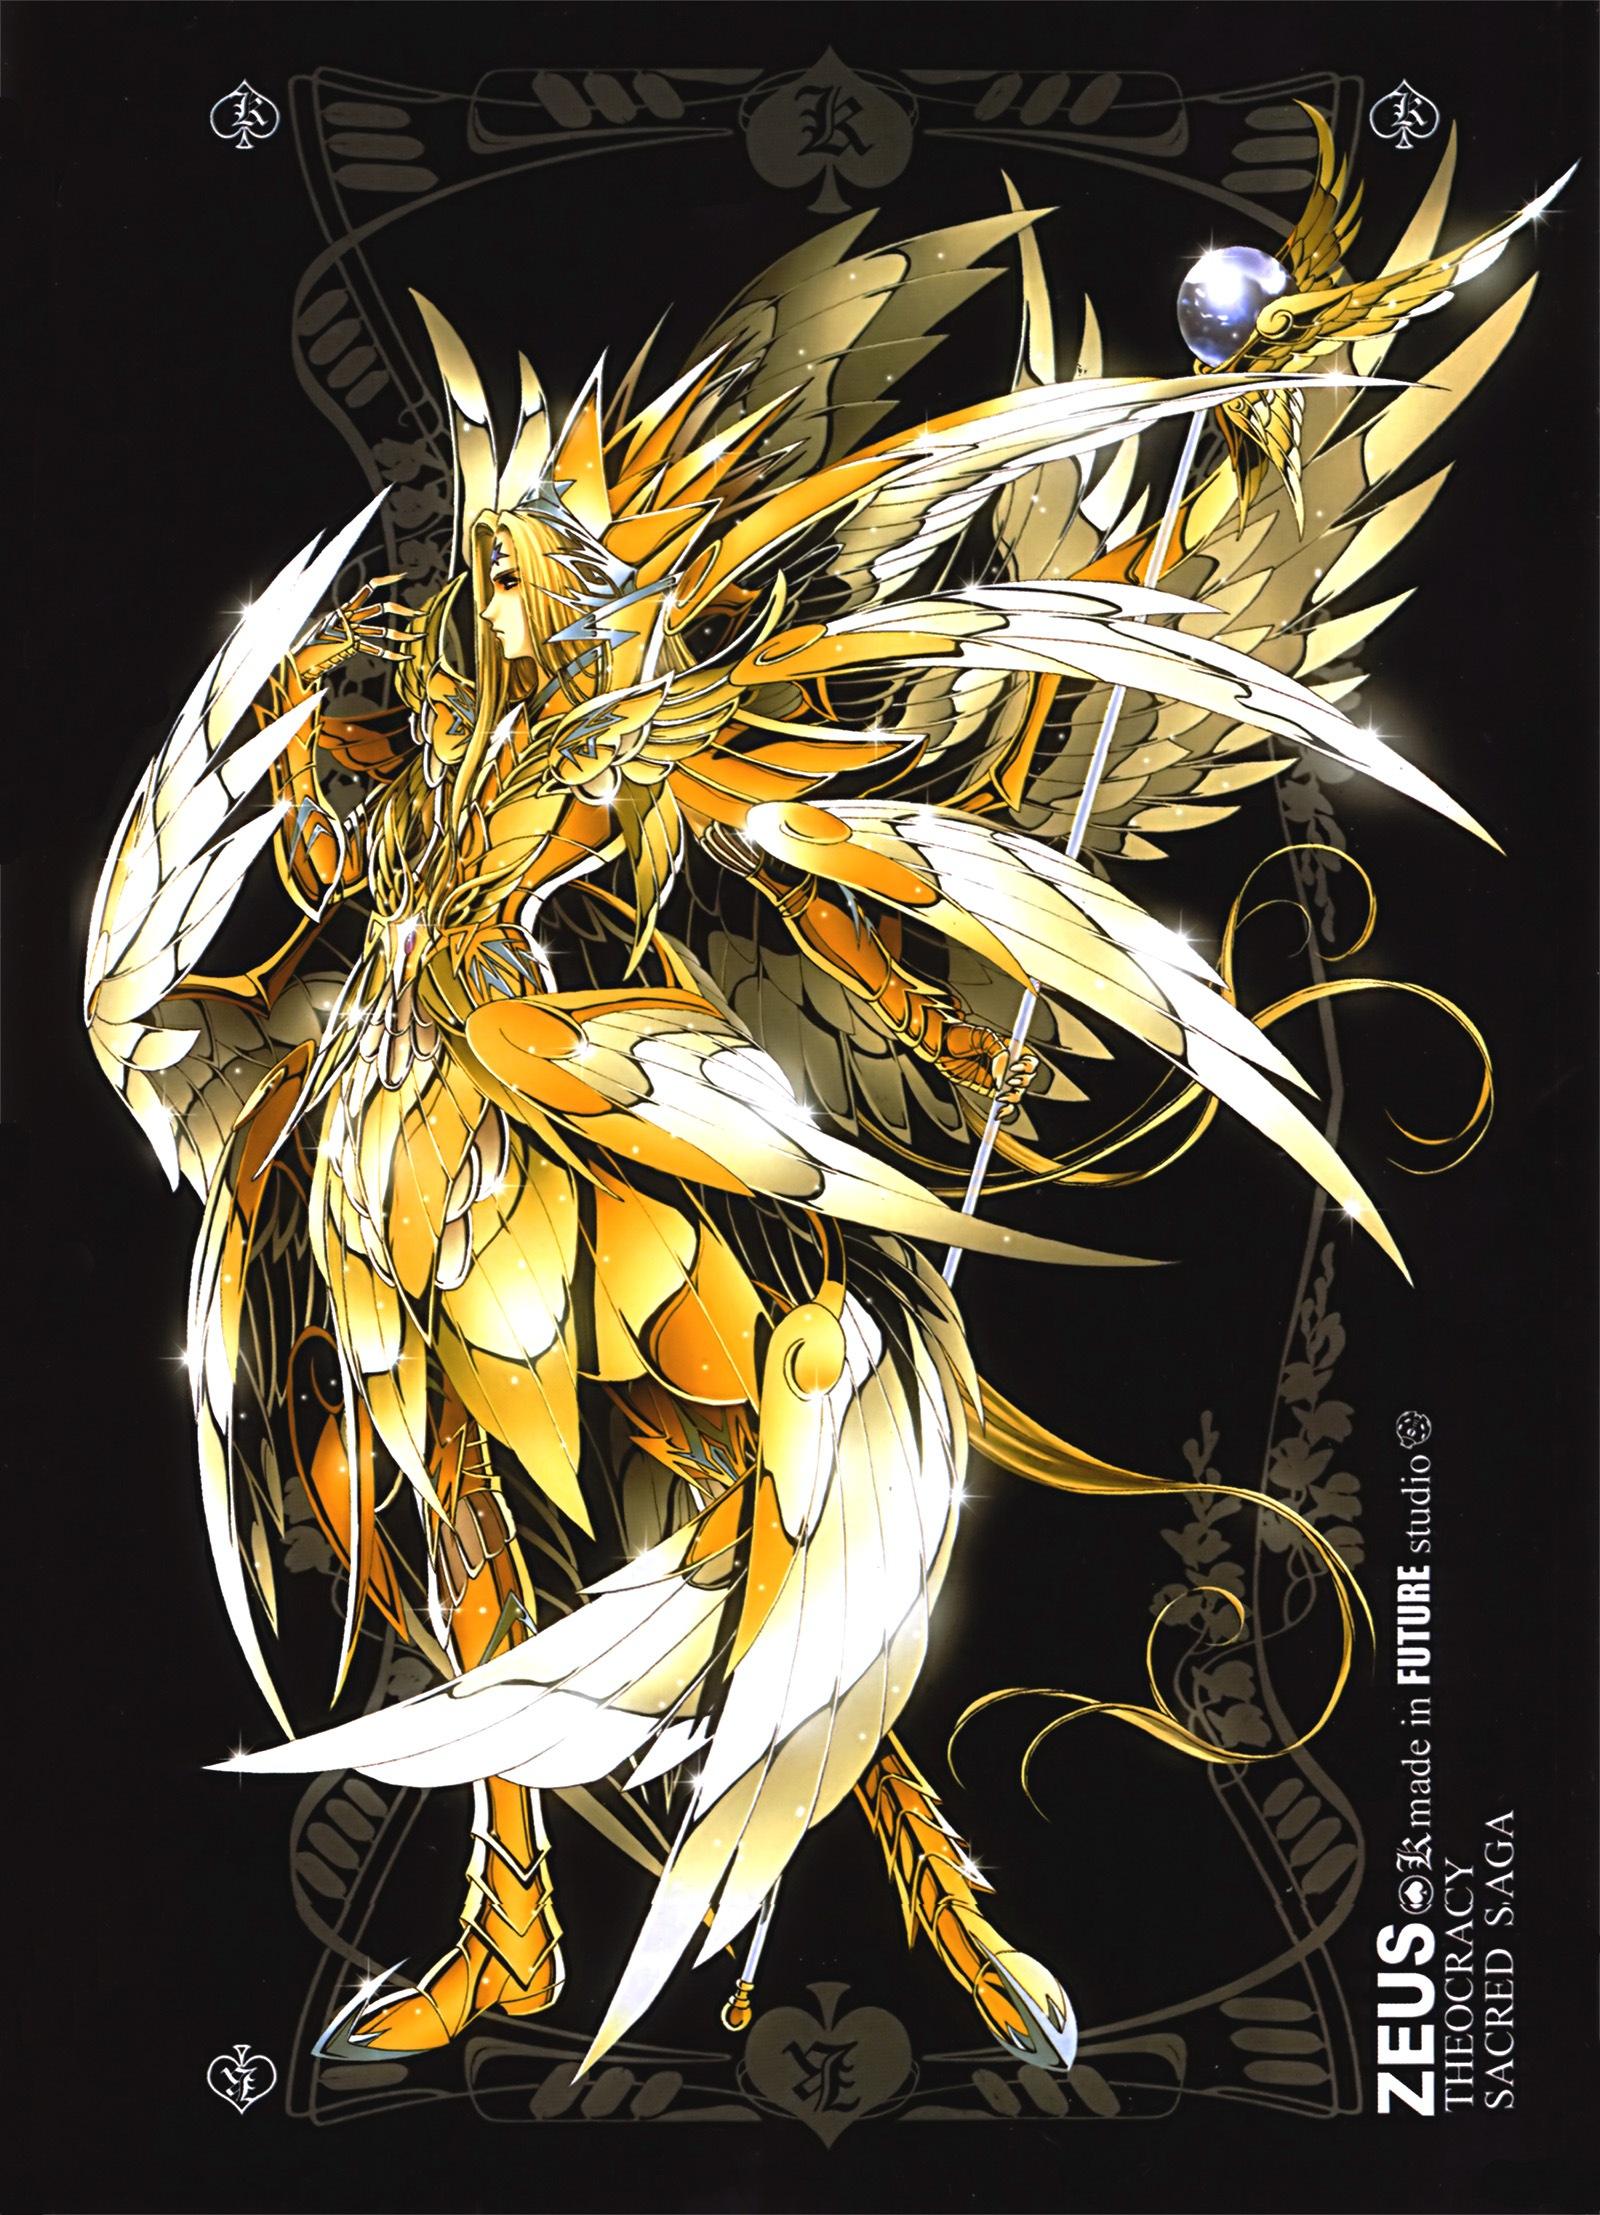 zeus greek myths mobile wallpaper 631748 zerochan anime